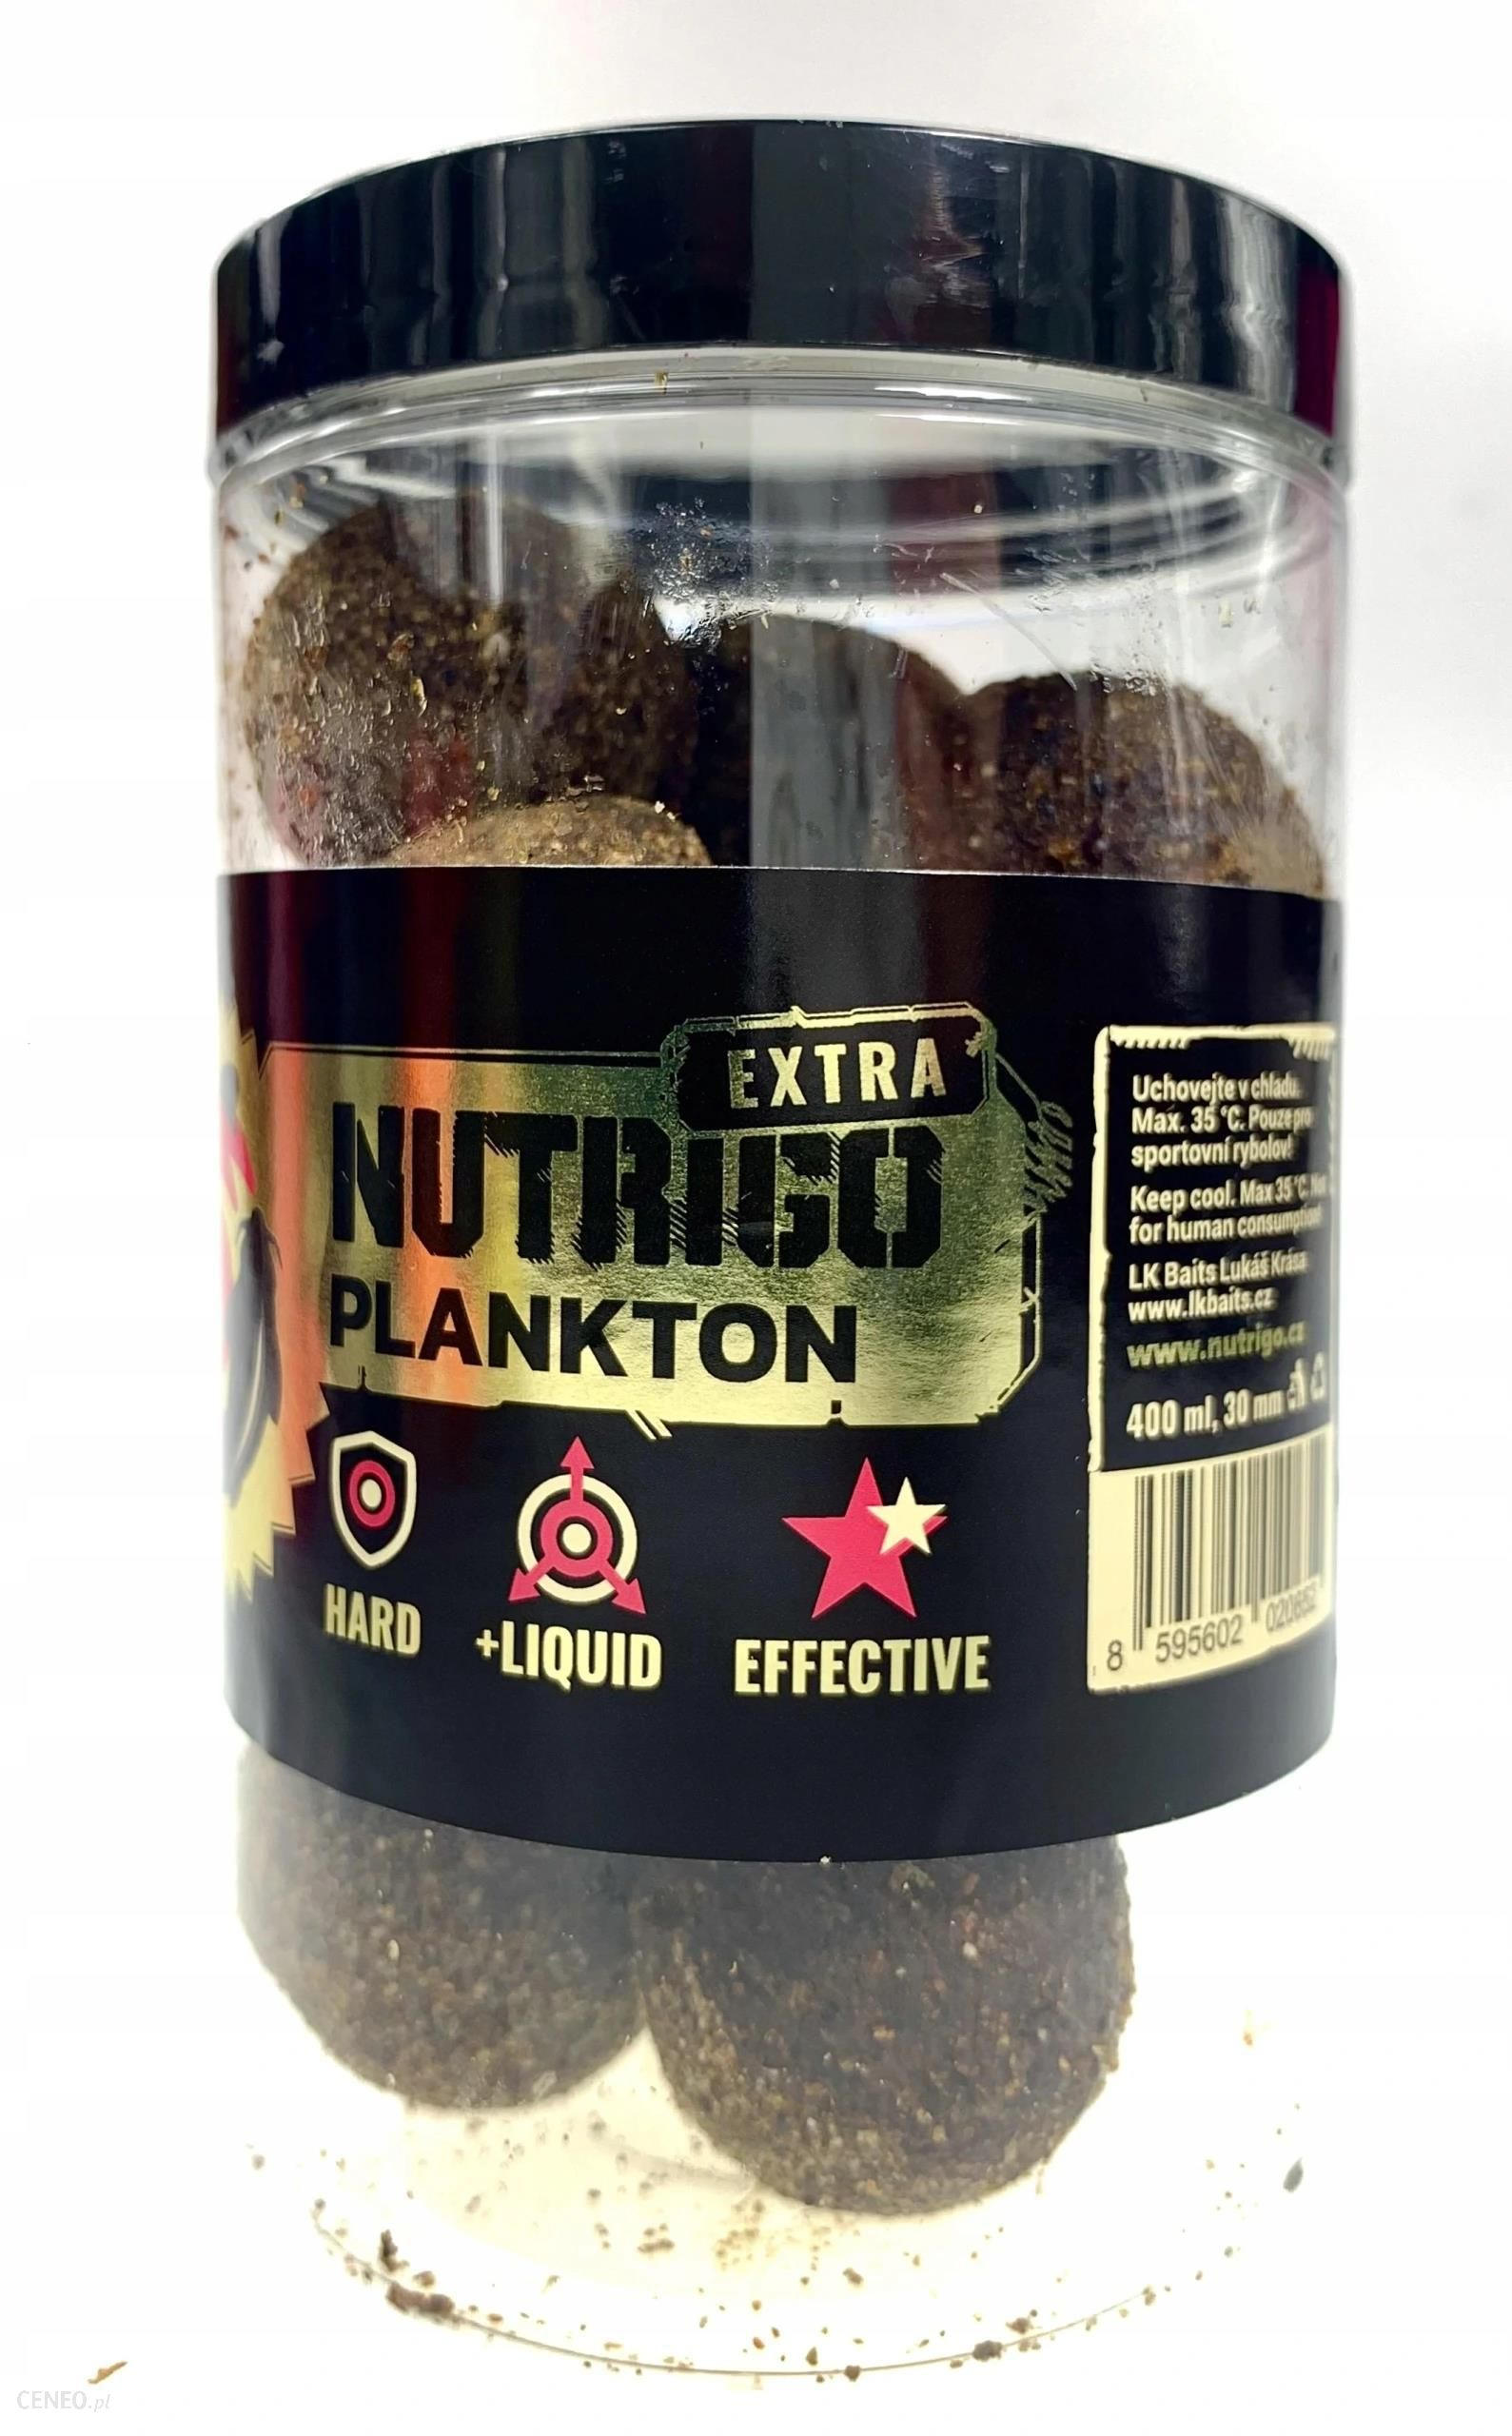 LK BAITS NUTRIGO EXTRA PLANKTON 30MM 400ML 04190144 (4190144)